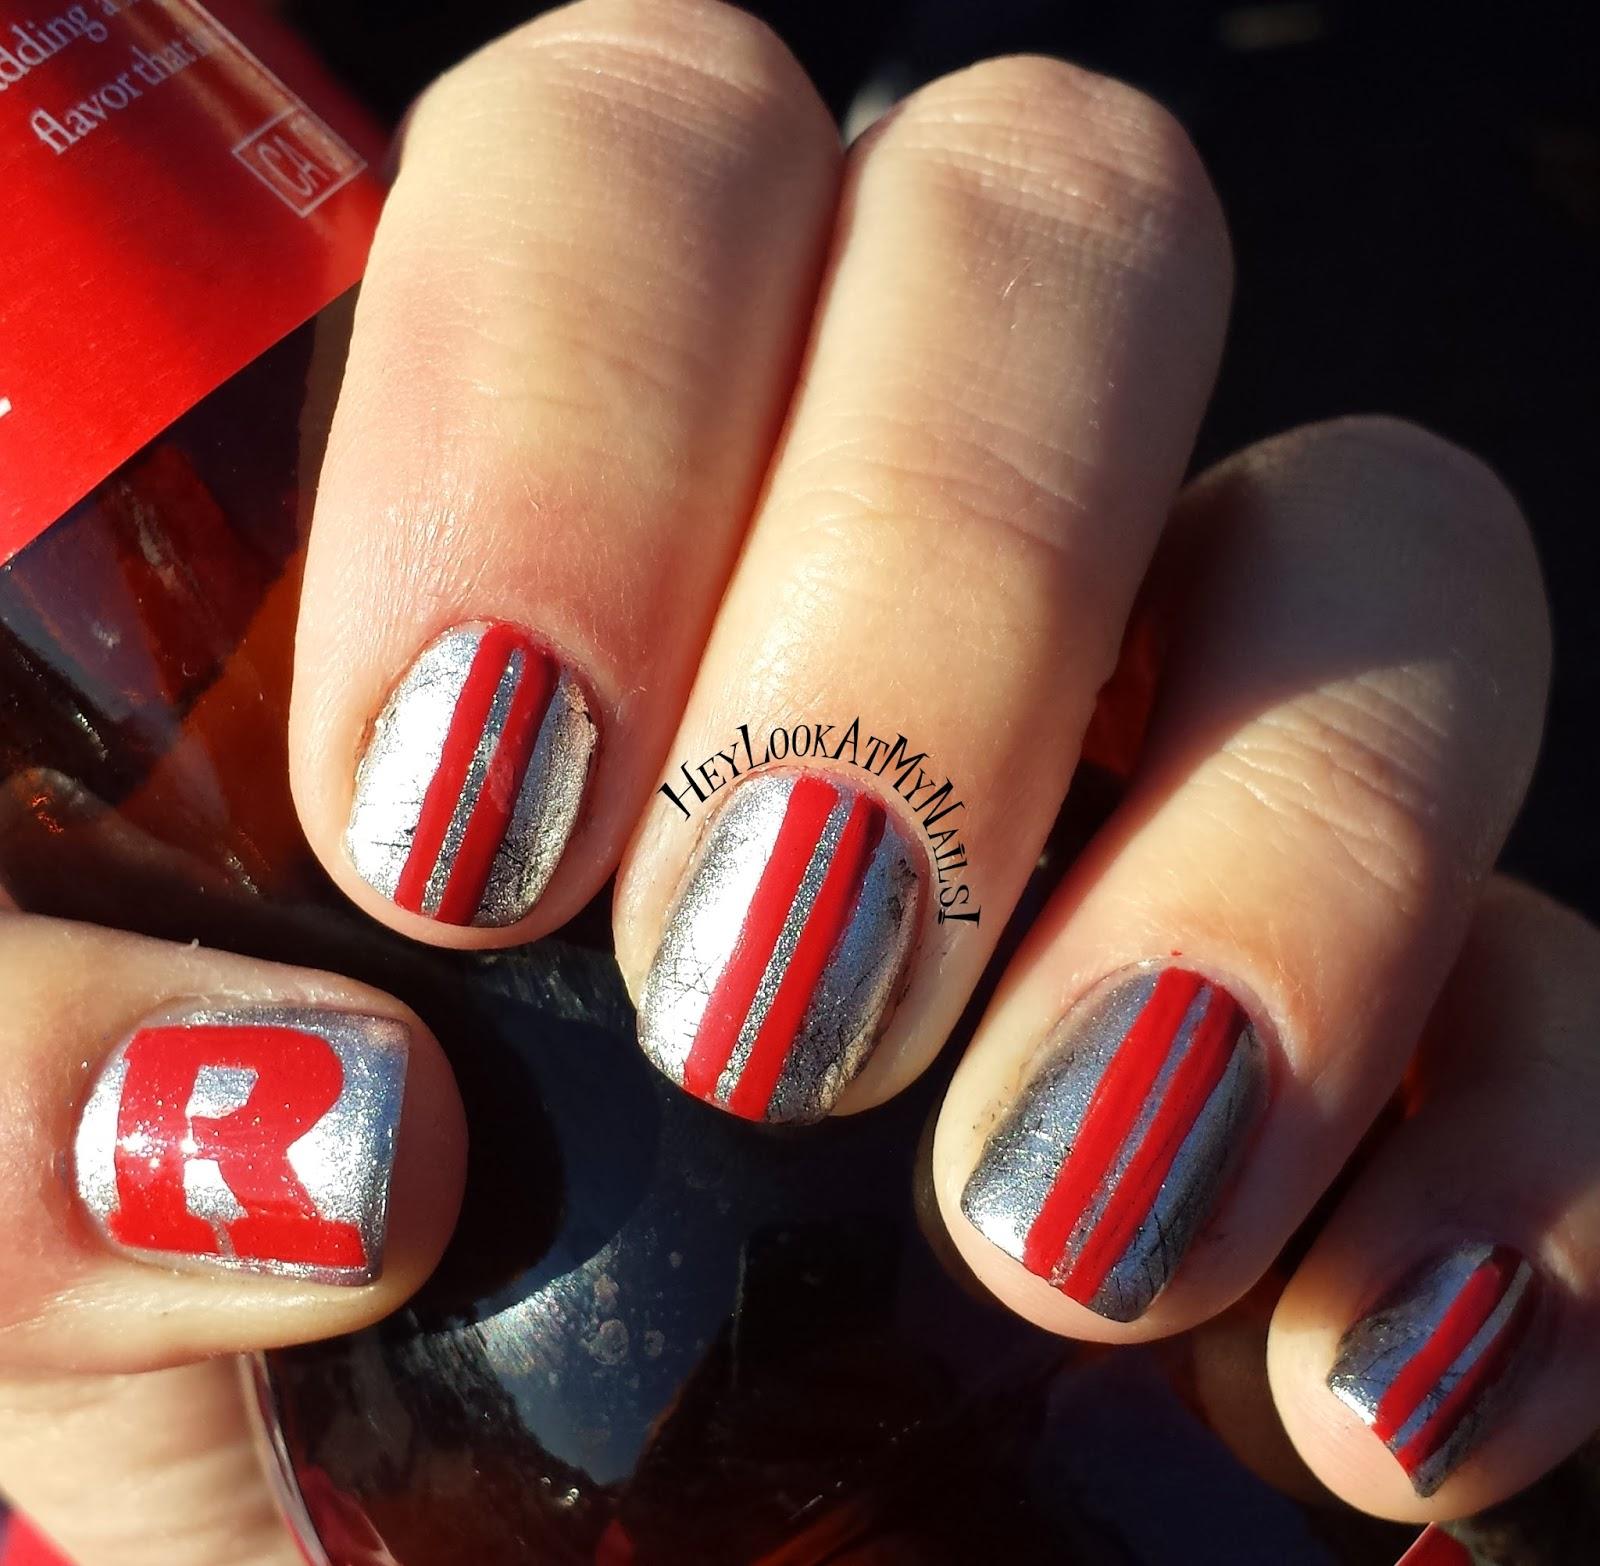 Hey Look At My Nails College Football Nail Art Ft My Sister